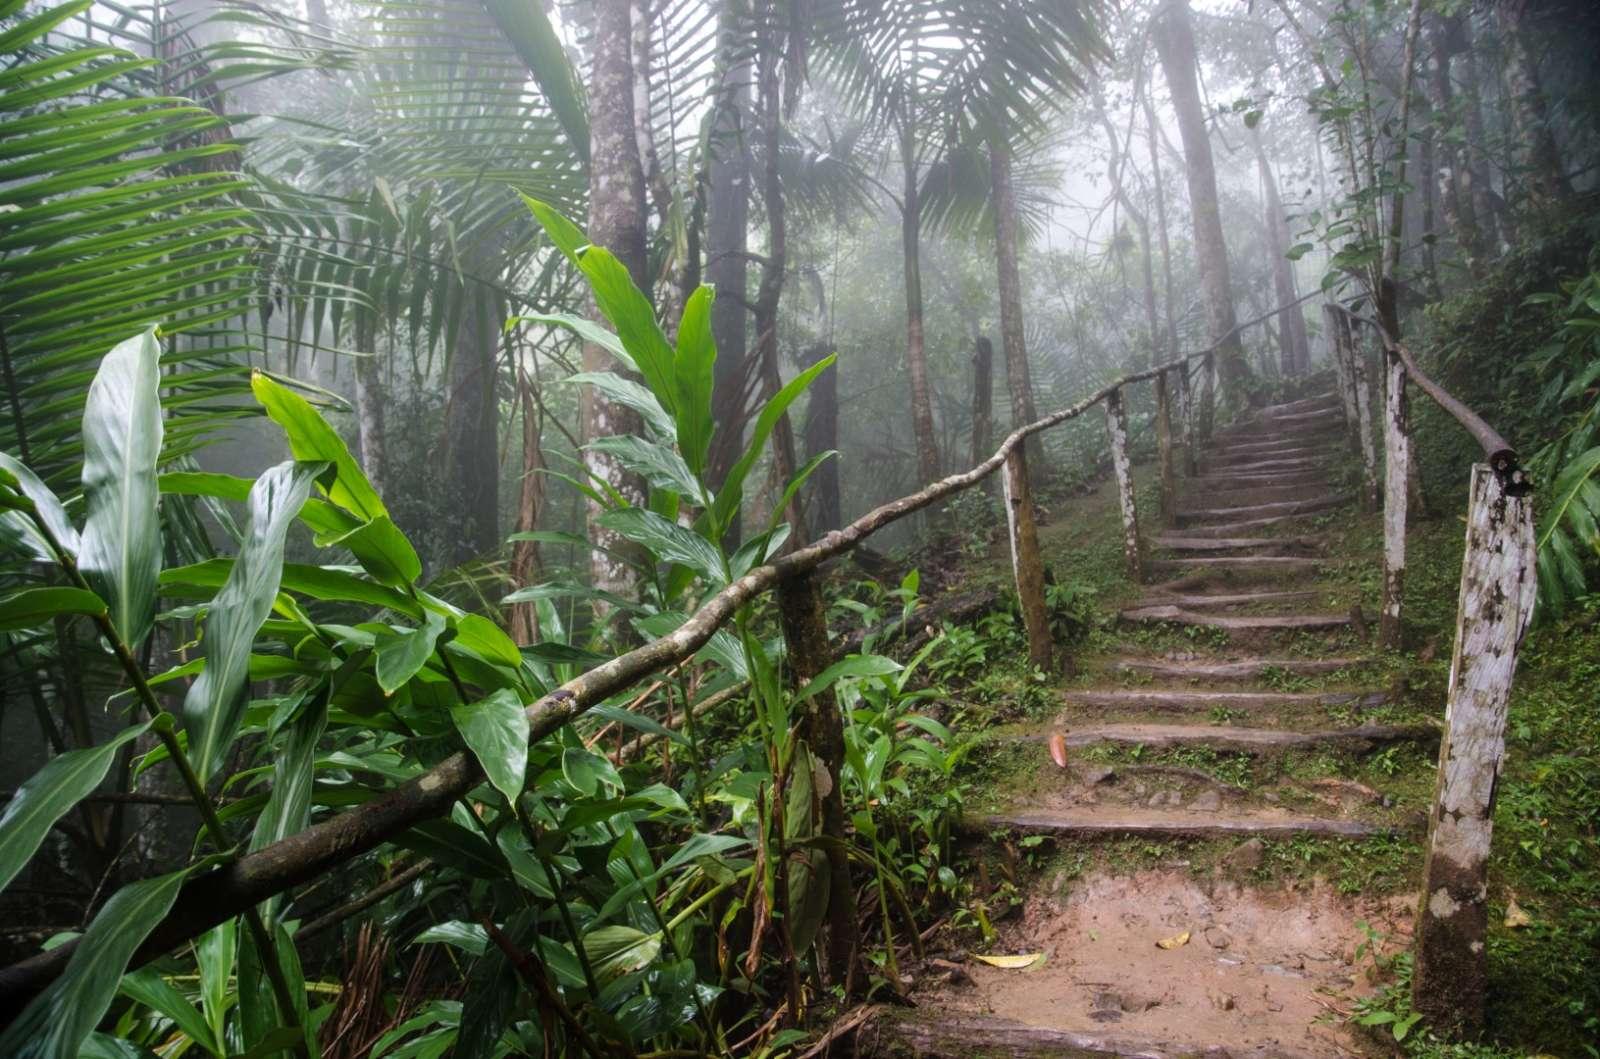 A trail in the Sierra Maestra Cuba